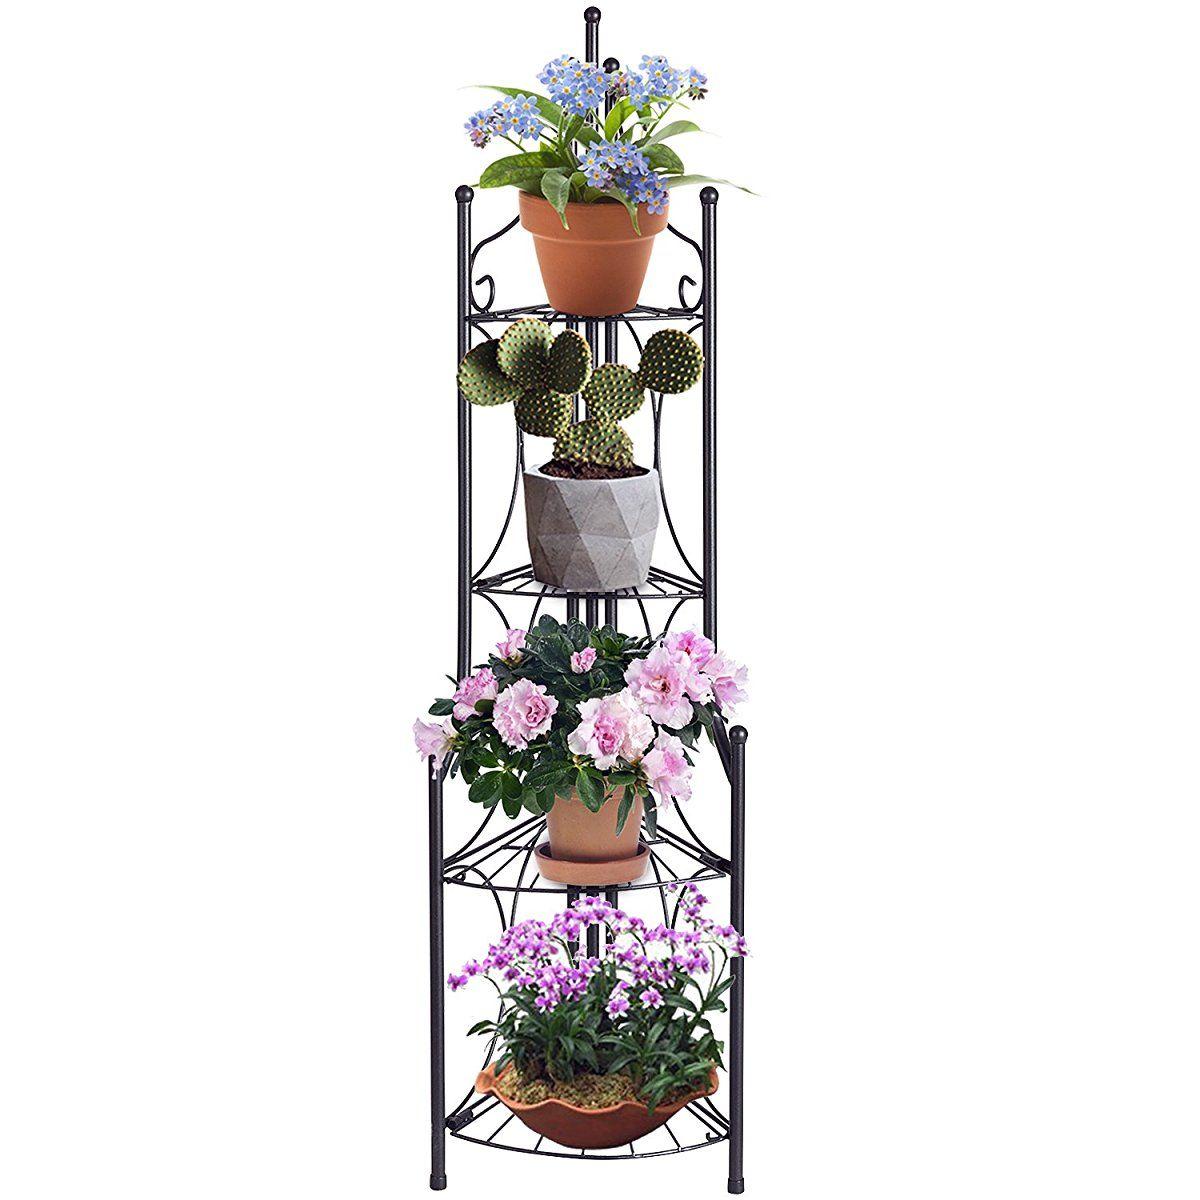 4 Tier Folding Plant Stand Plant Stand Plant Shelves Outdoor Corner Shelves